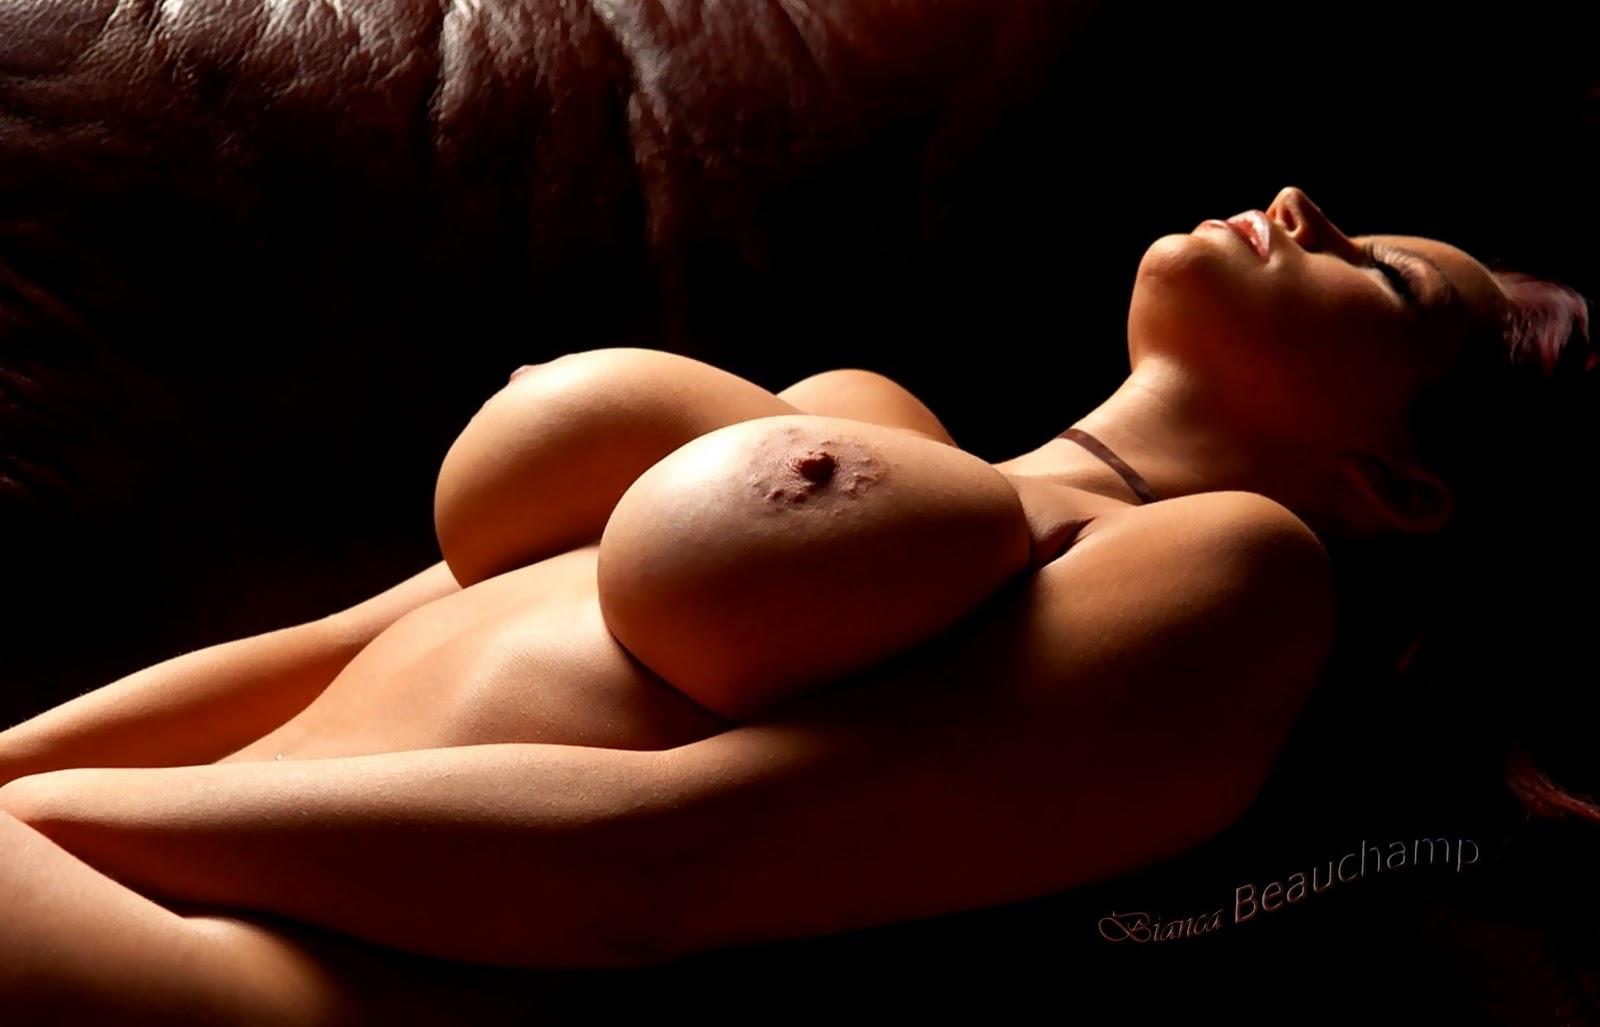 Beautiful Women Playboy Playmates Rainpow